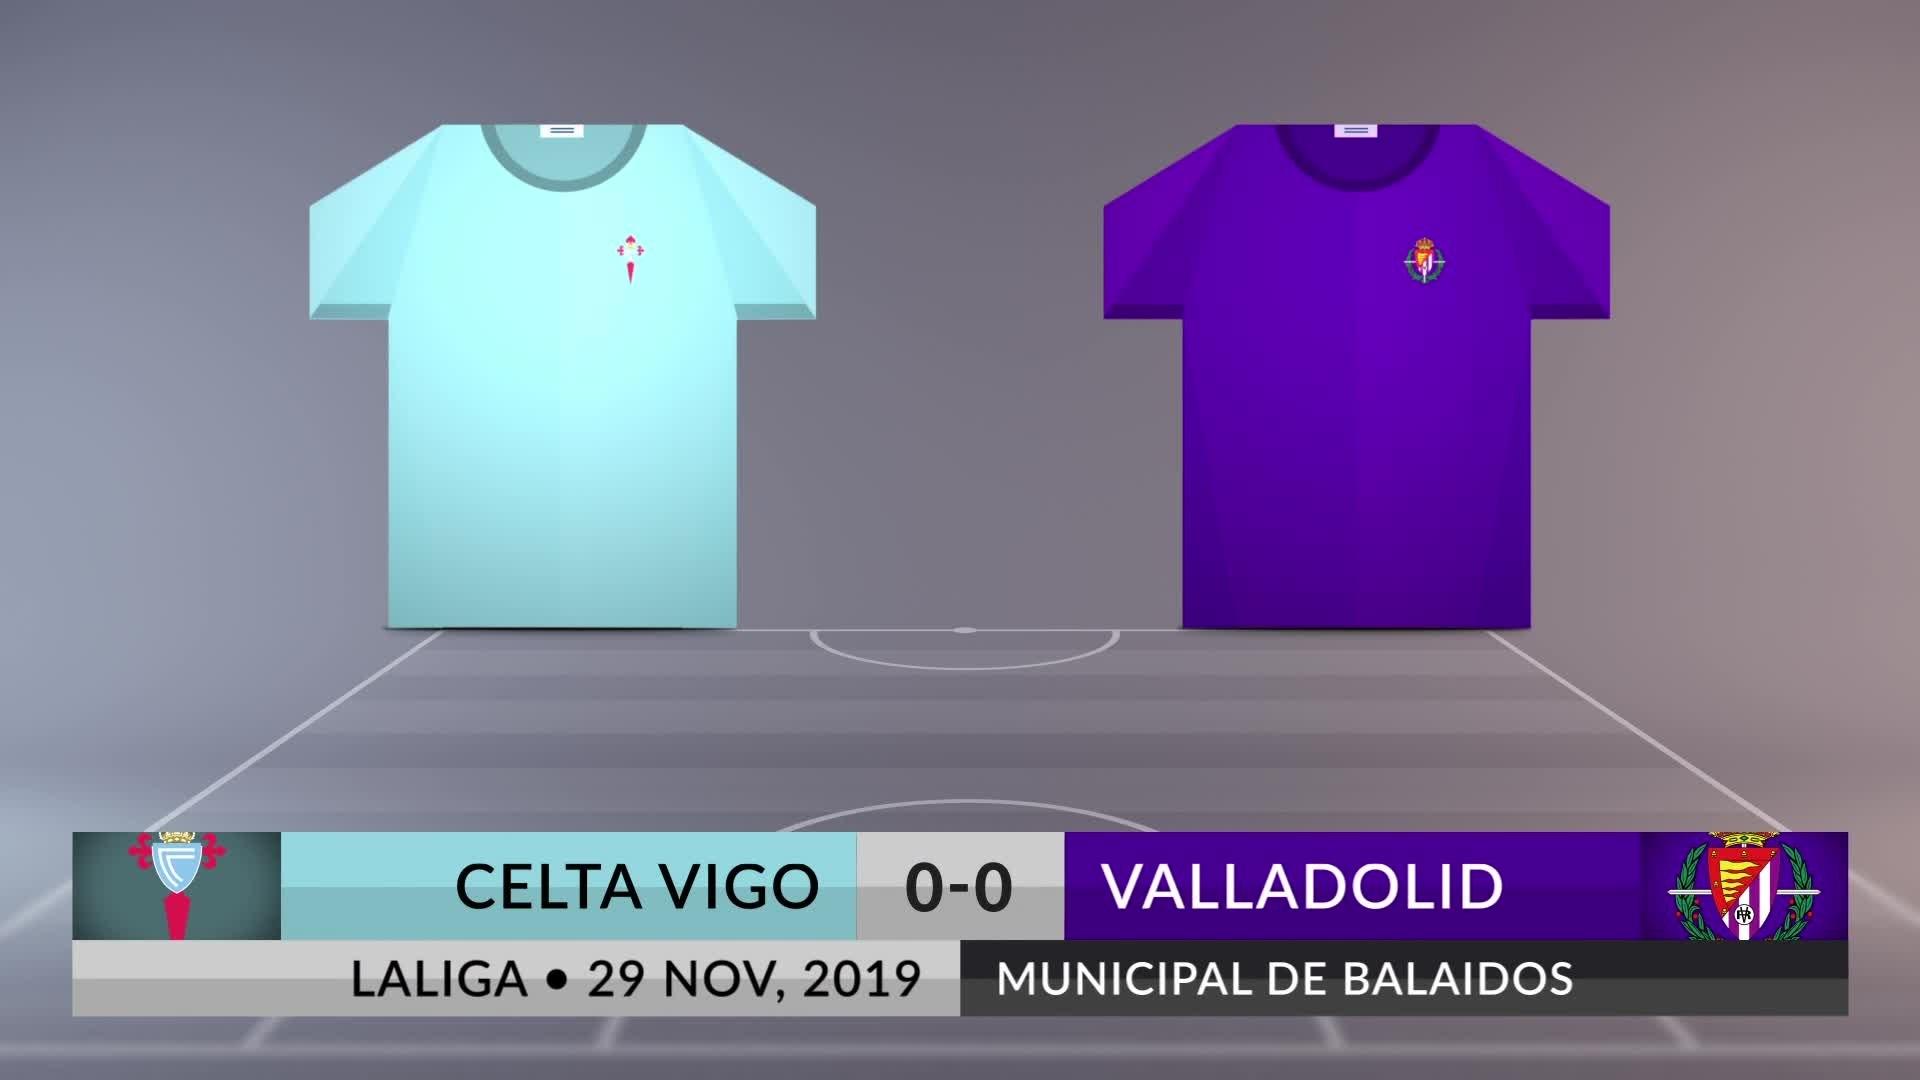 Match Review: Celta Vigo vs Valladolid on 29/11/2019